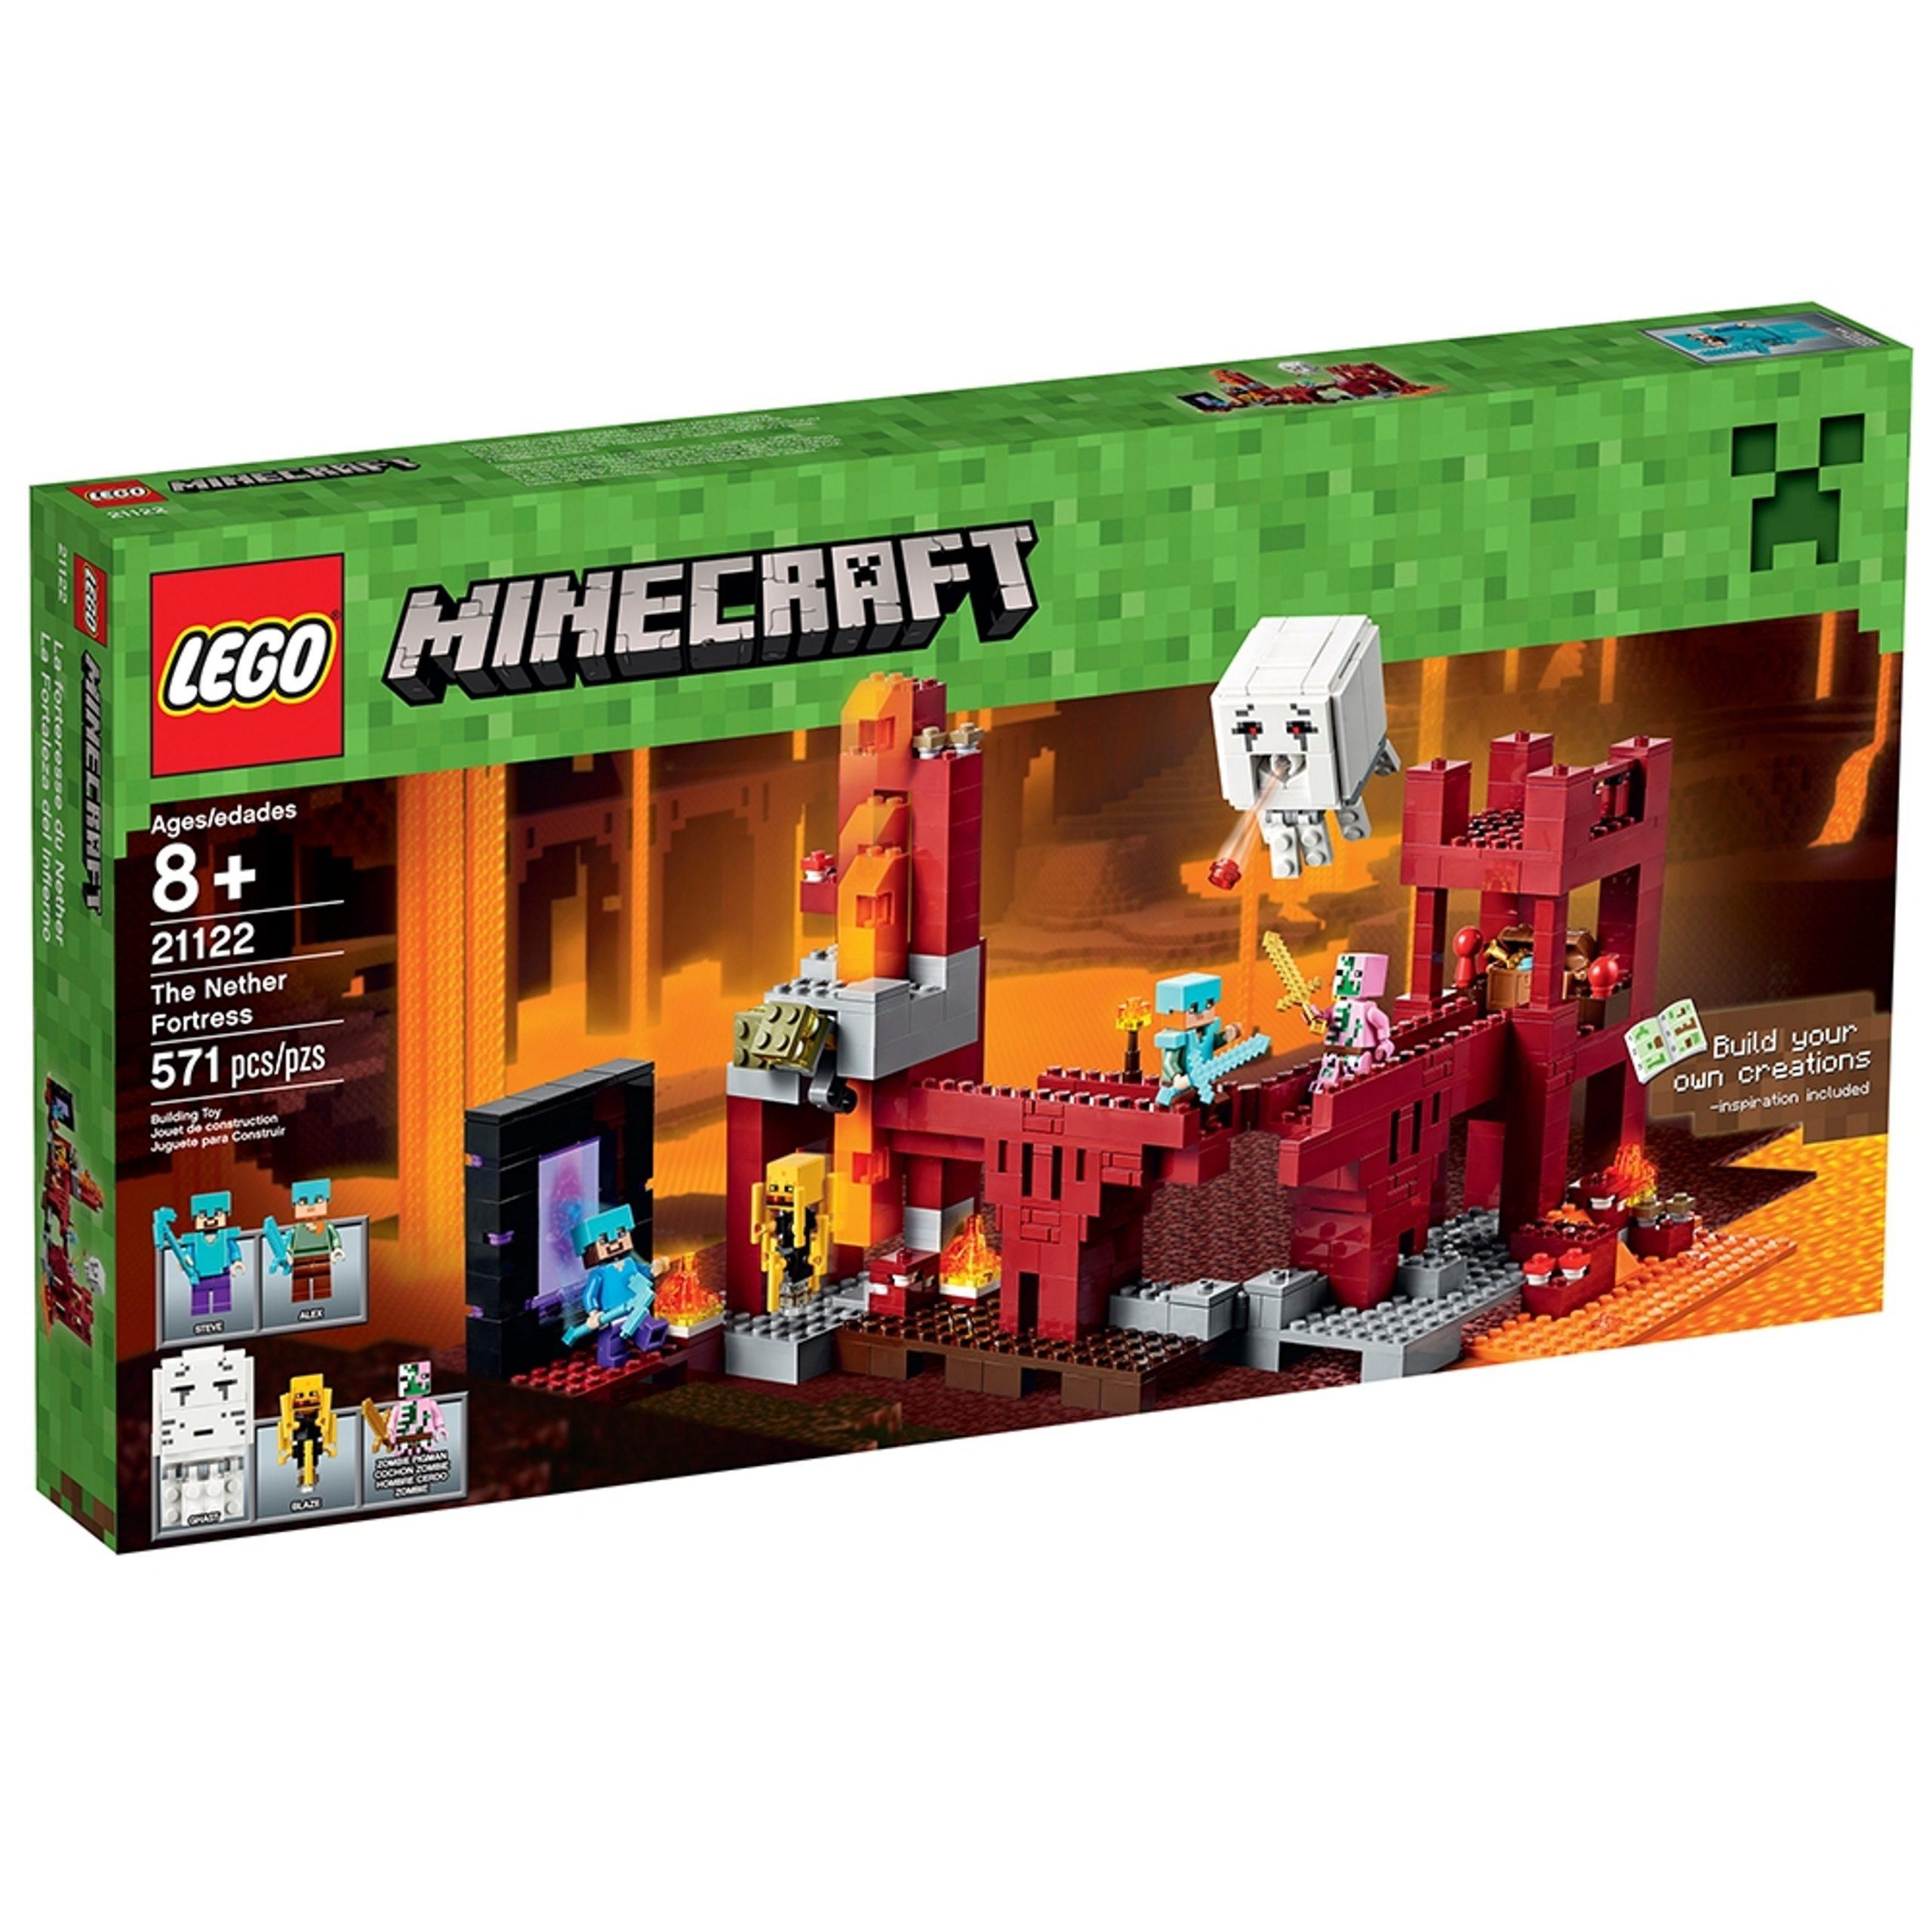 lego 21122 netherfaestningen scaled